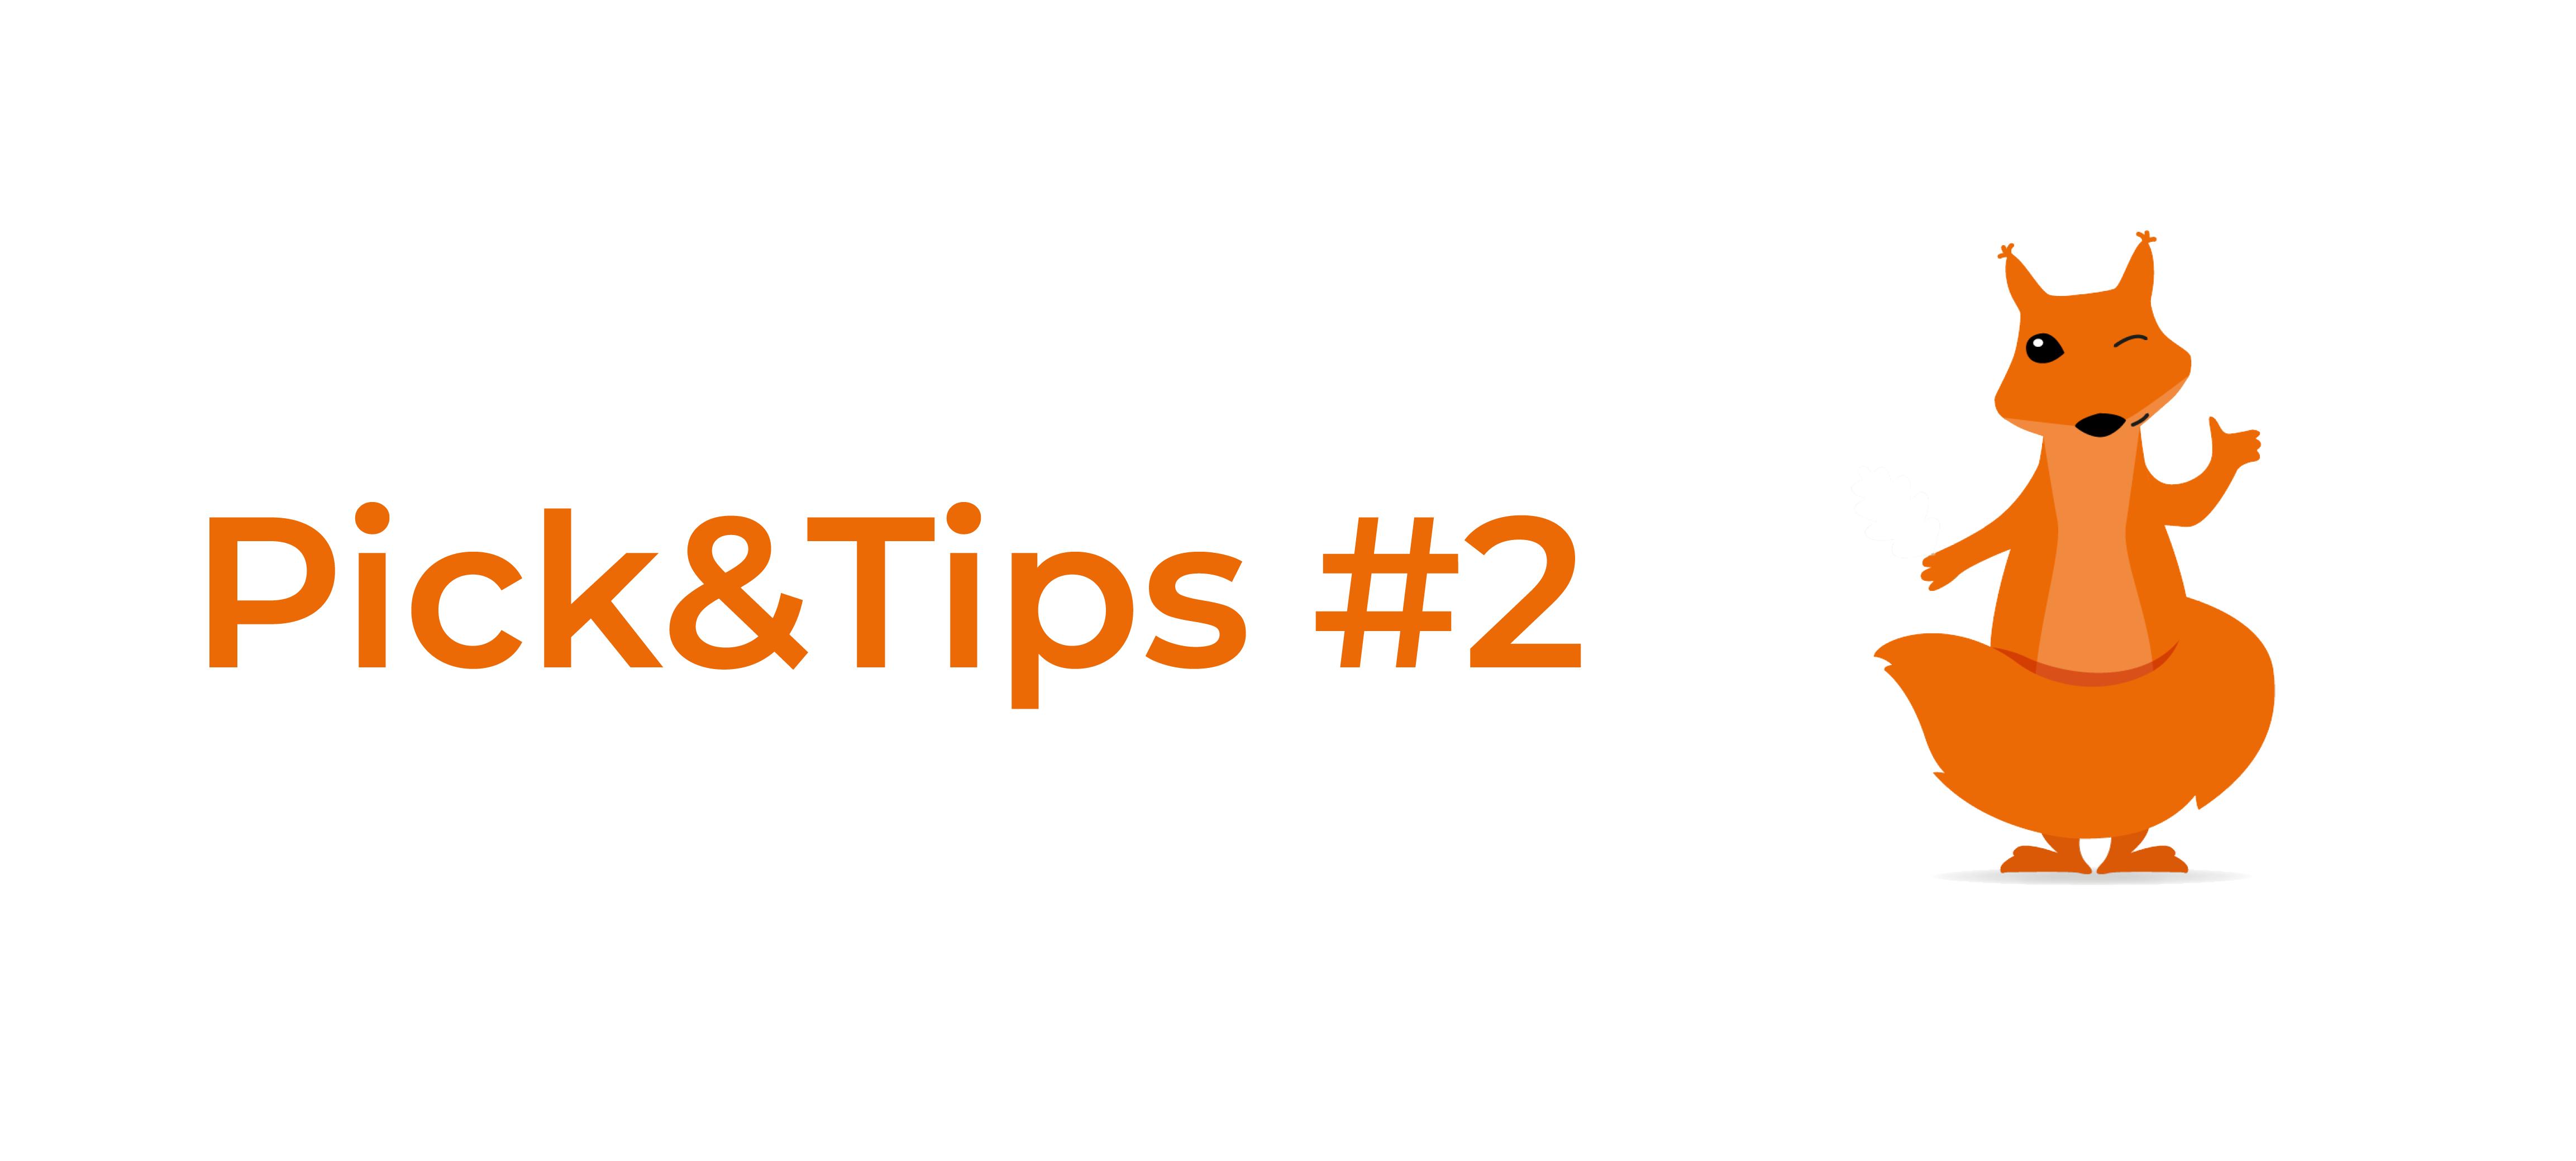 Pick&Tips #2